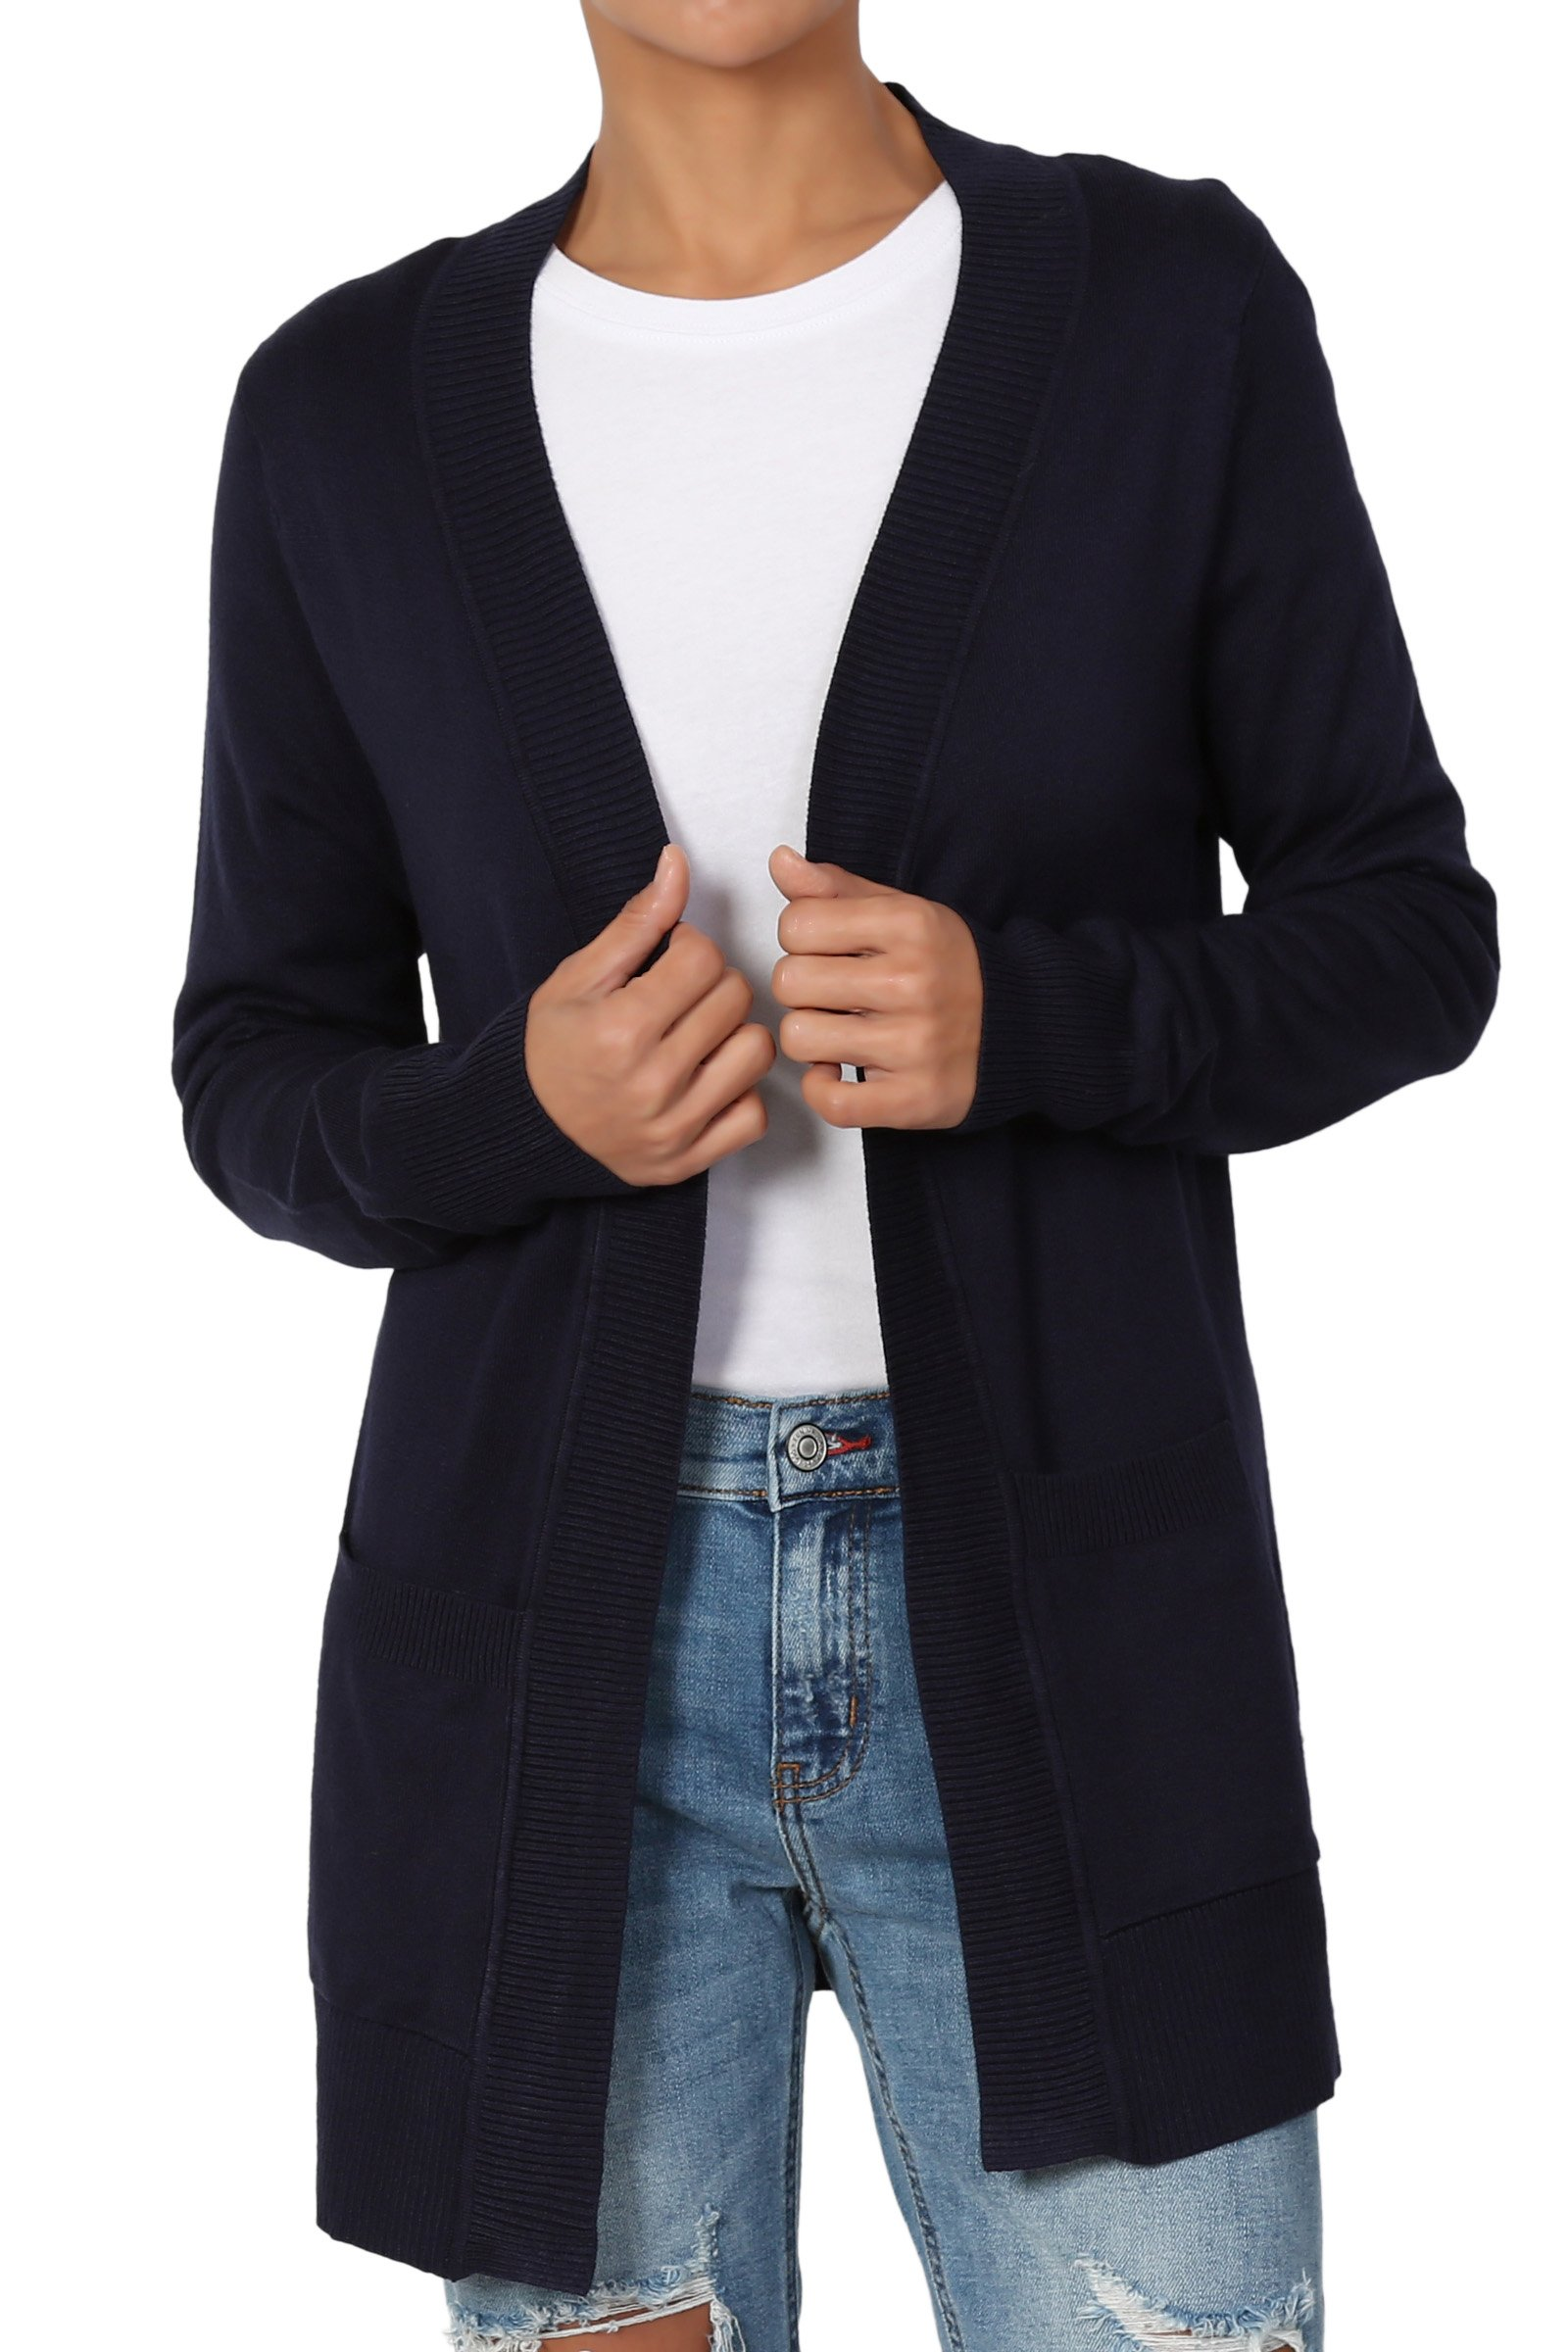 TheMogan Women's Open Front Pockets Knit Sweater Cardigan Navy 3XL